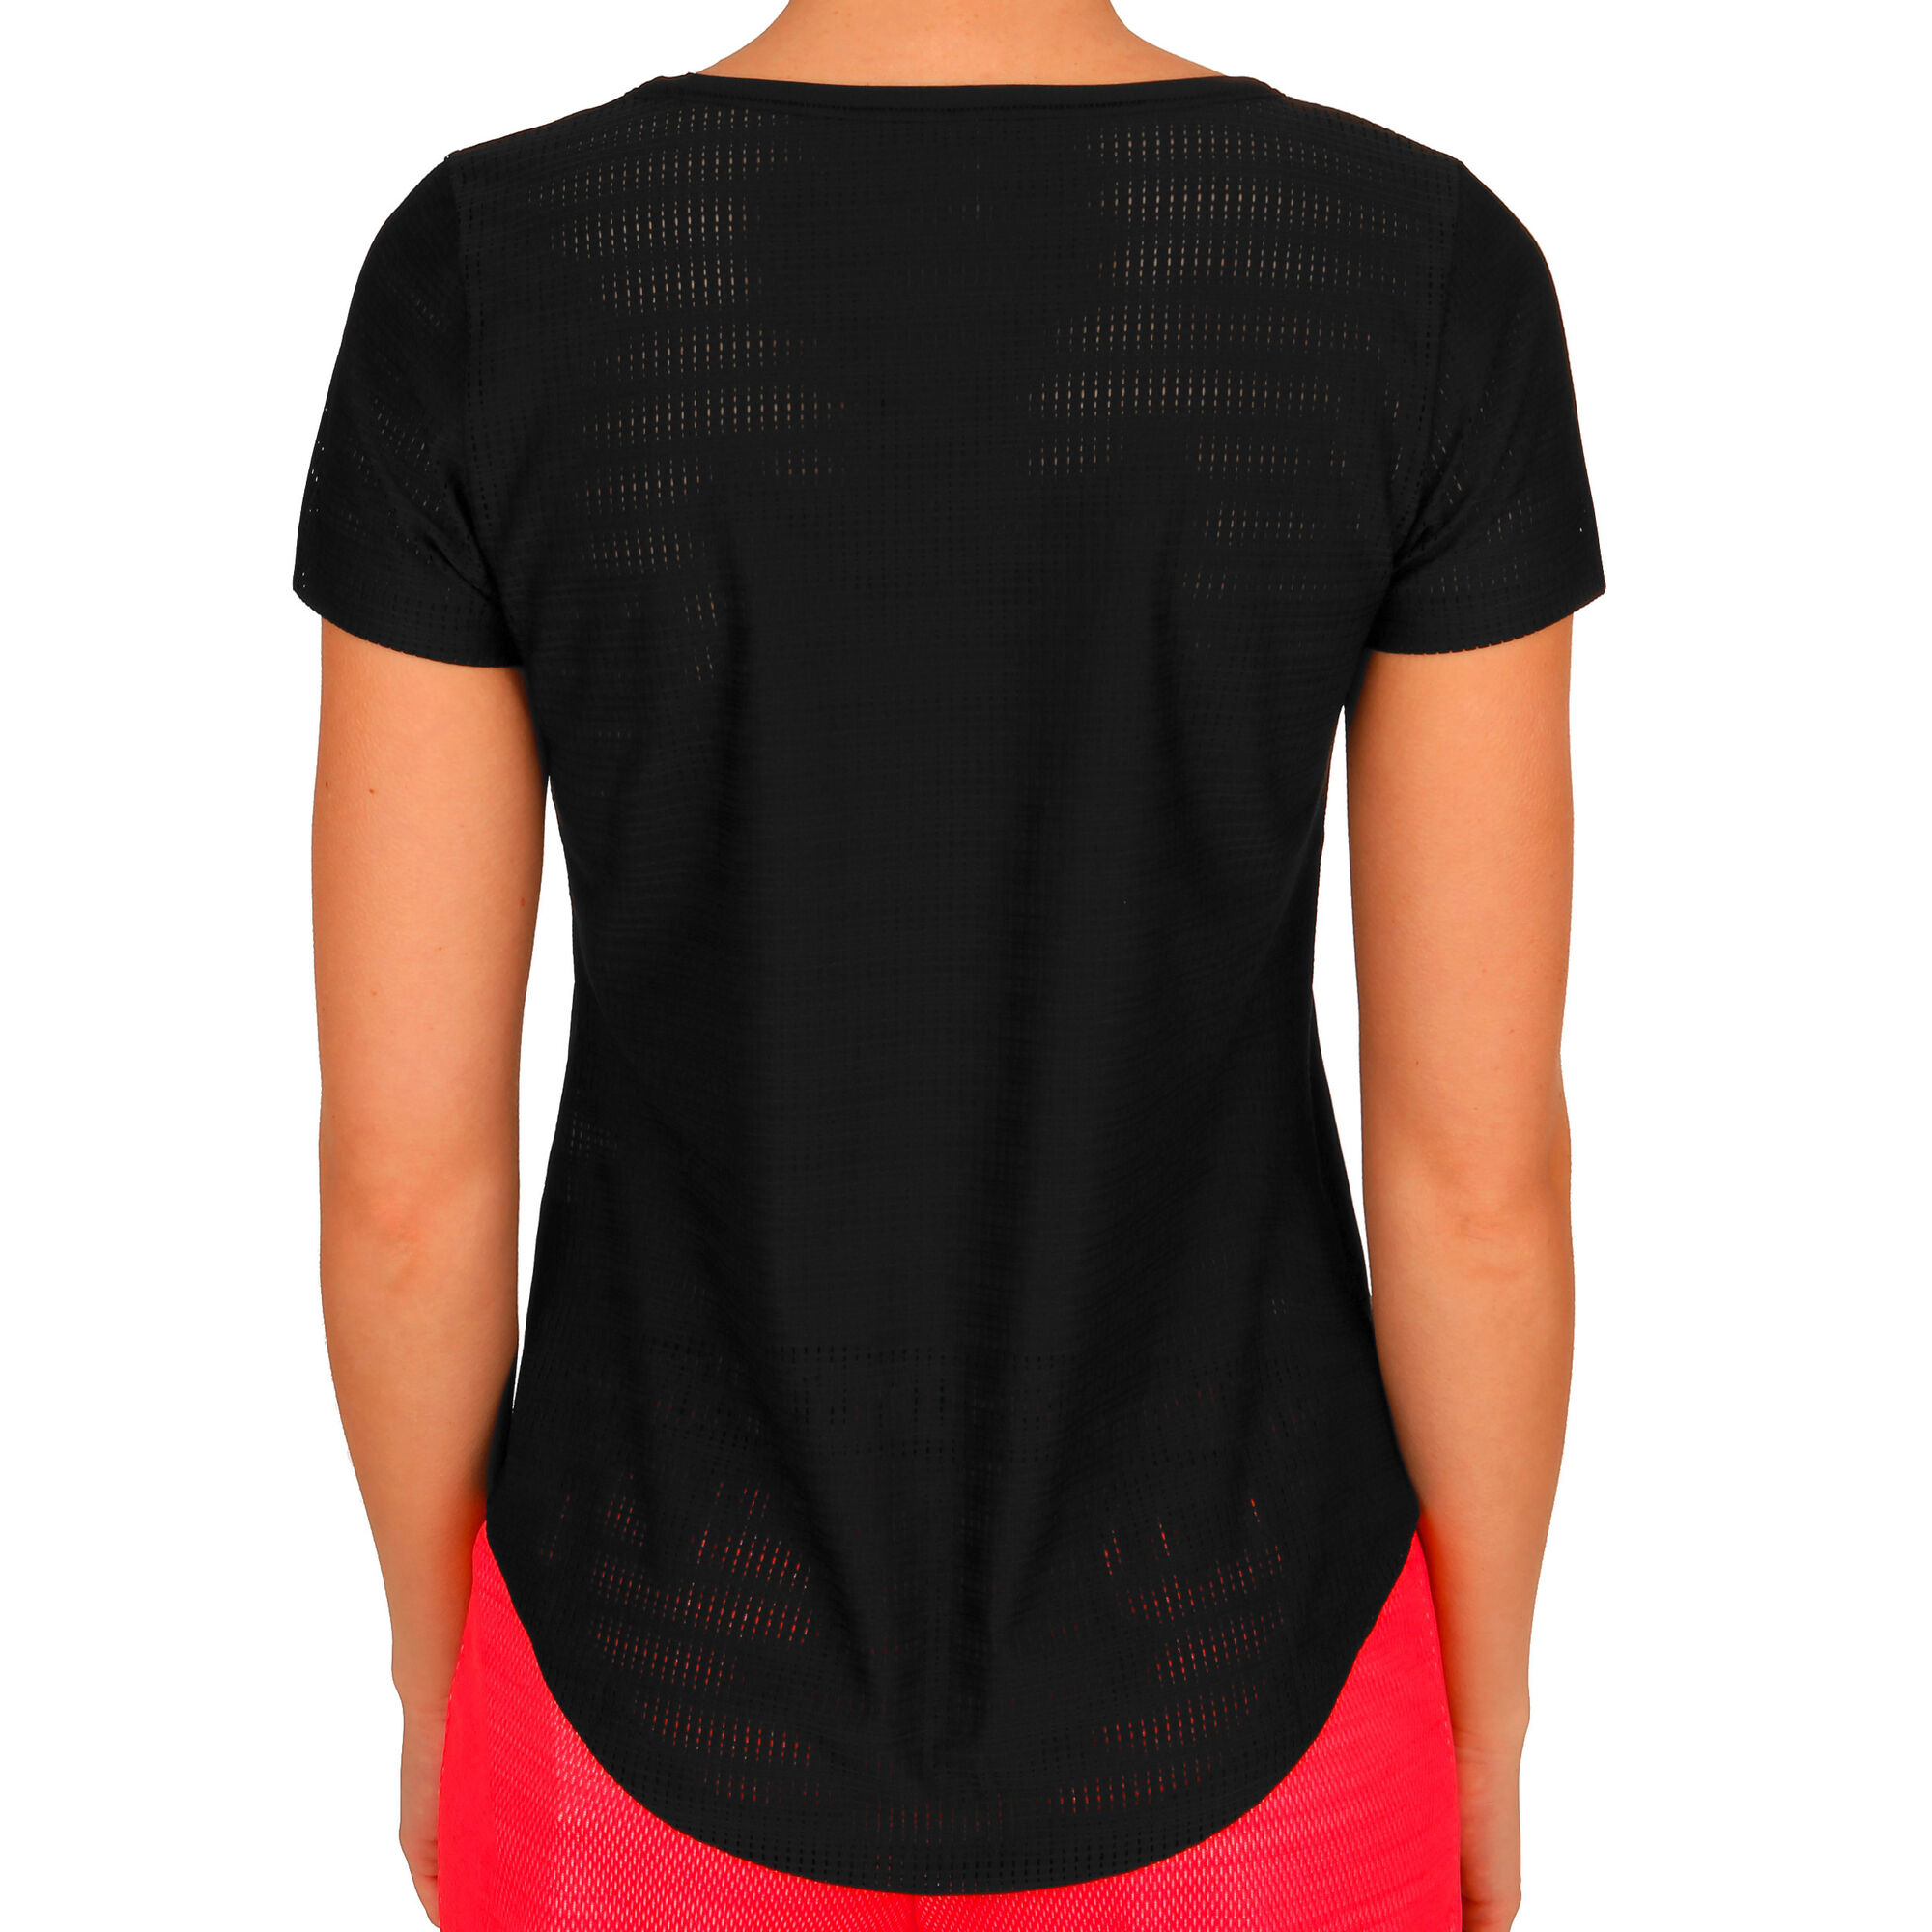 e3965829c Black Mesh T Shirt Womens - DREAMWORKS